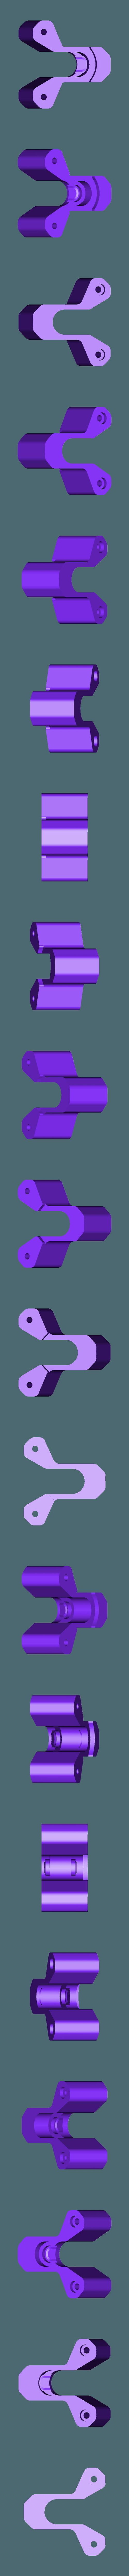 Gearhead_v2-0_99.STL Download free STL file Extruder Mount (Printrbot Gear Head) • 3D printable design, WalterHsiao